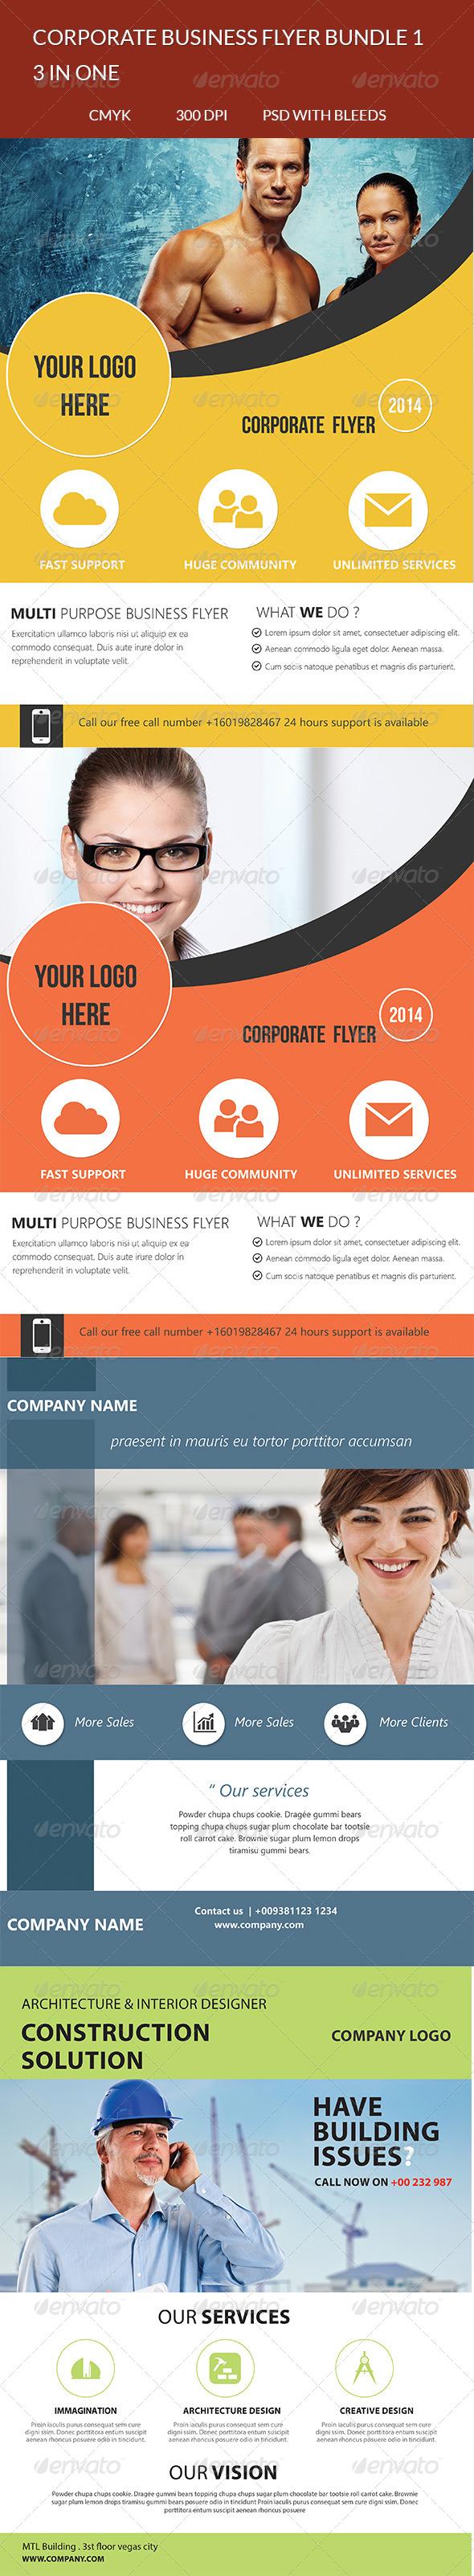 GraphicRiver Corporate Business Flyer Bundle V1 7440281